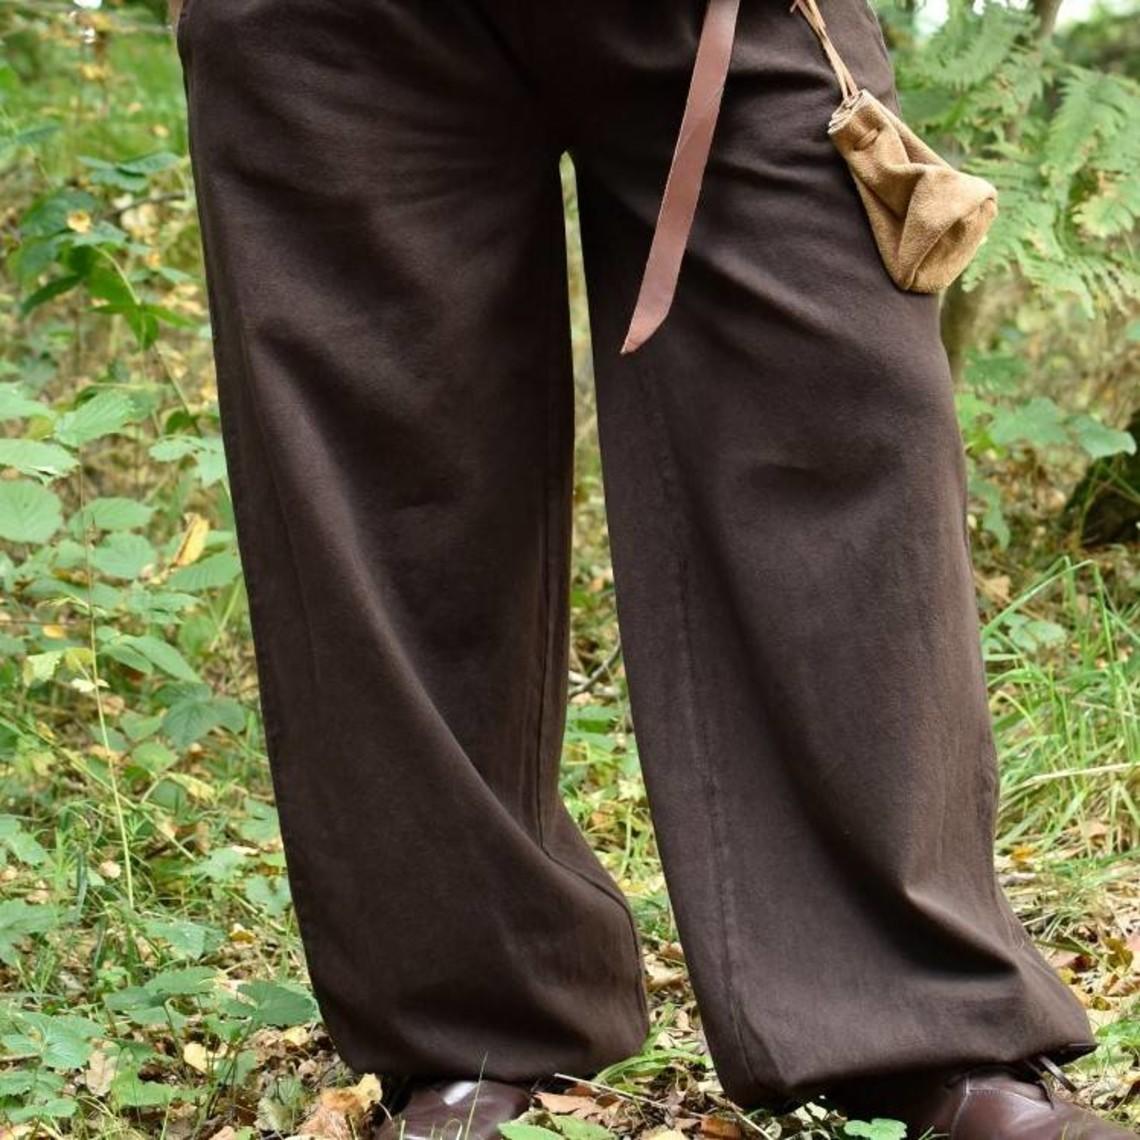 Pantaloni Roger, marrone